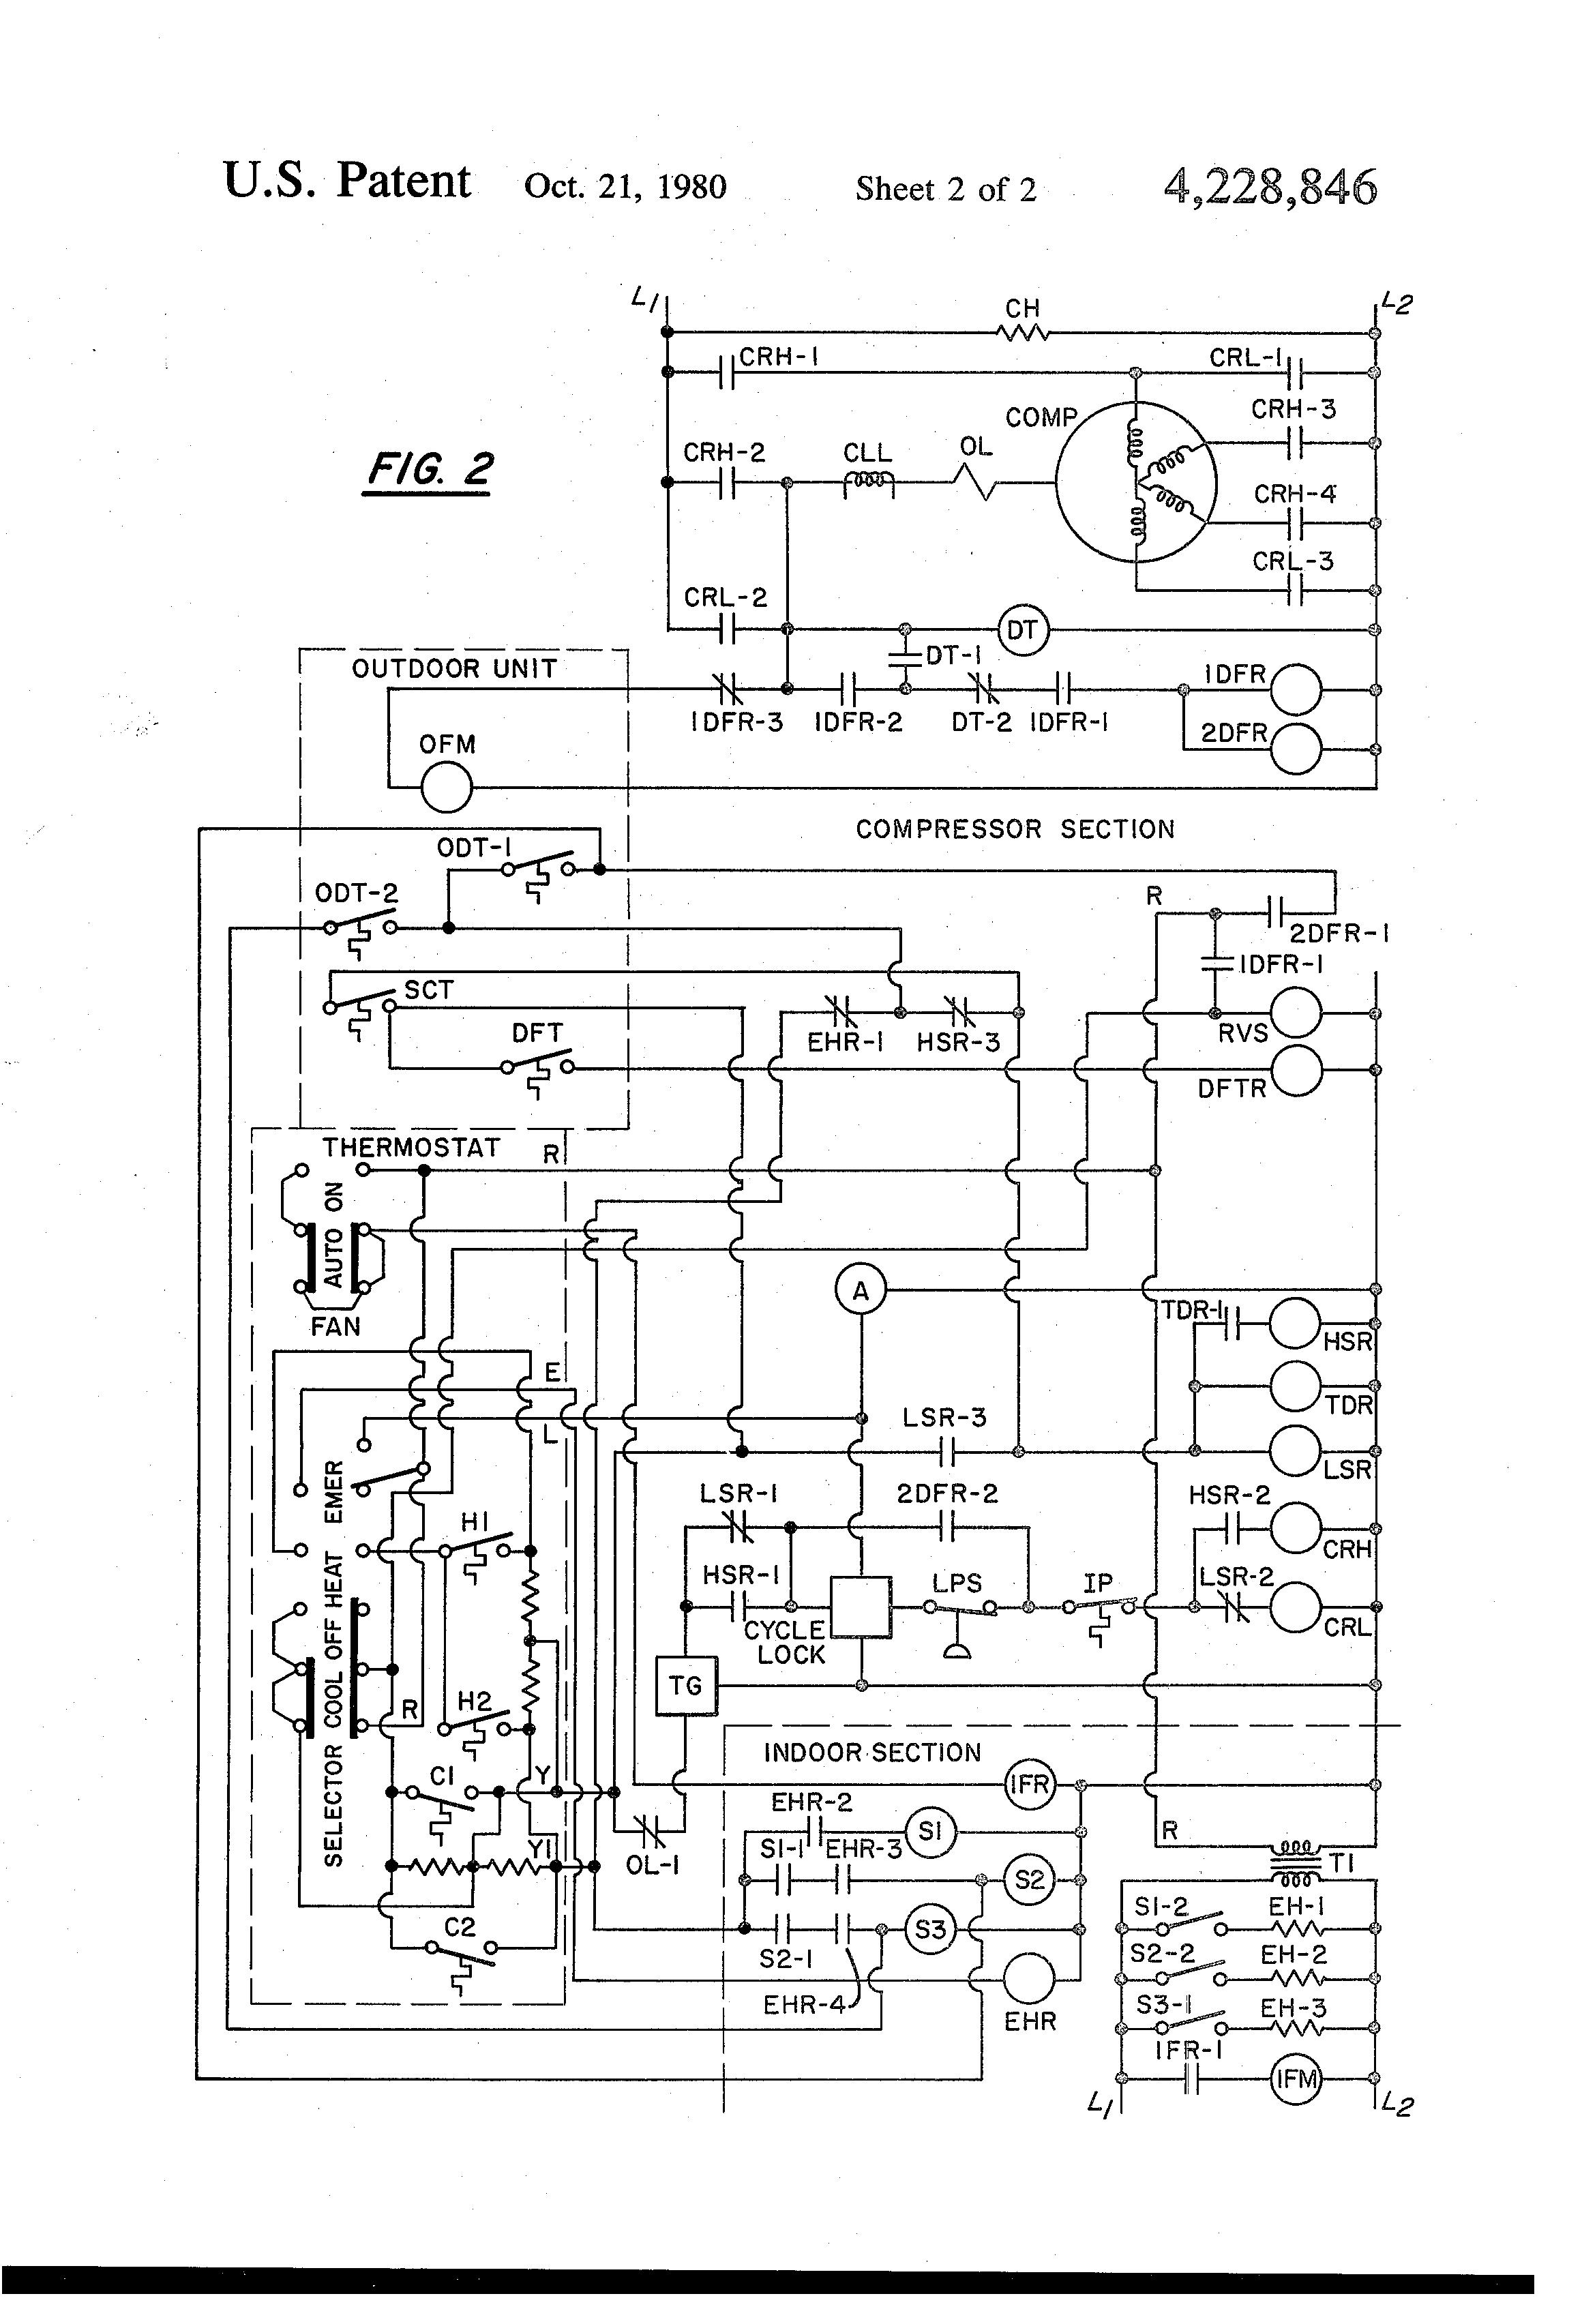 DIAGRAM] Modine Pd 250a Wiring Diagram FULL Version HD Quality Wiring  Diagram - SOCIALDIAGRAM.SPANOBAR.ITDiagram Database